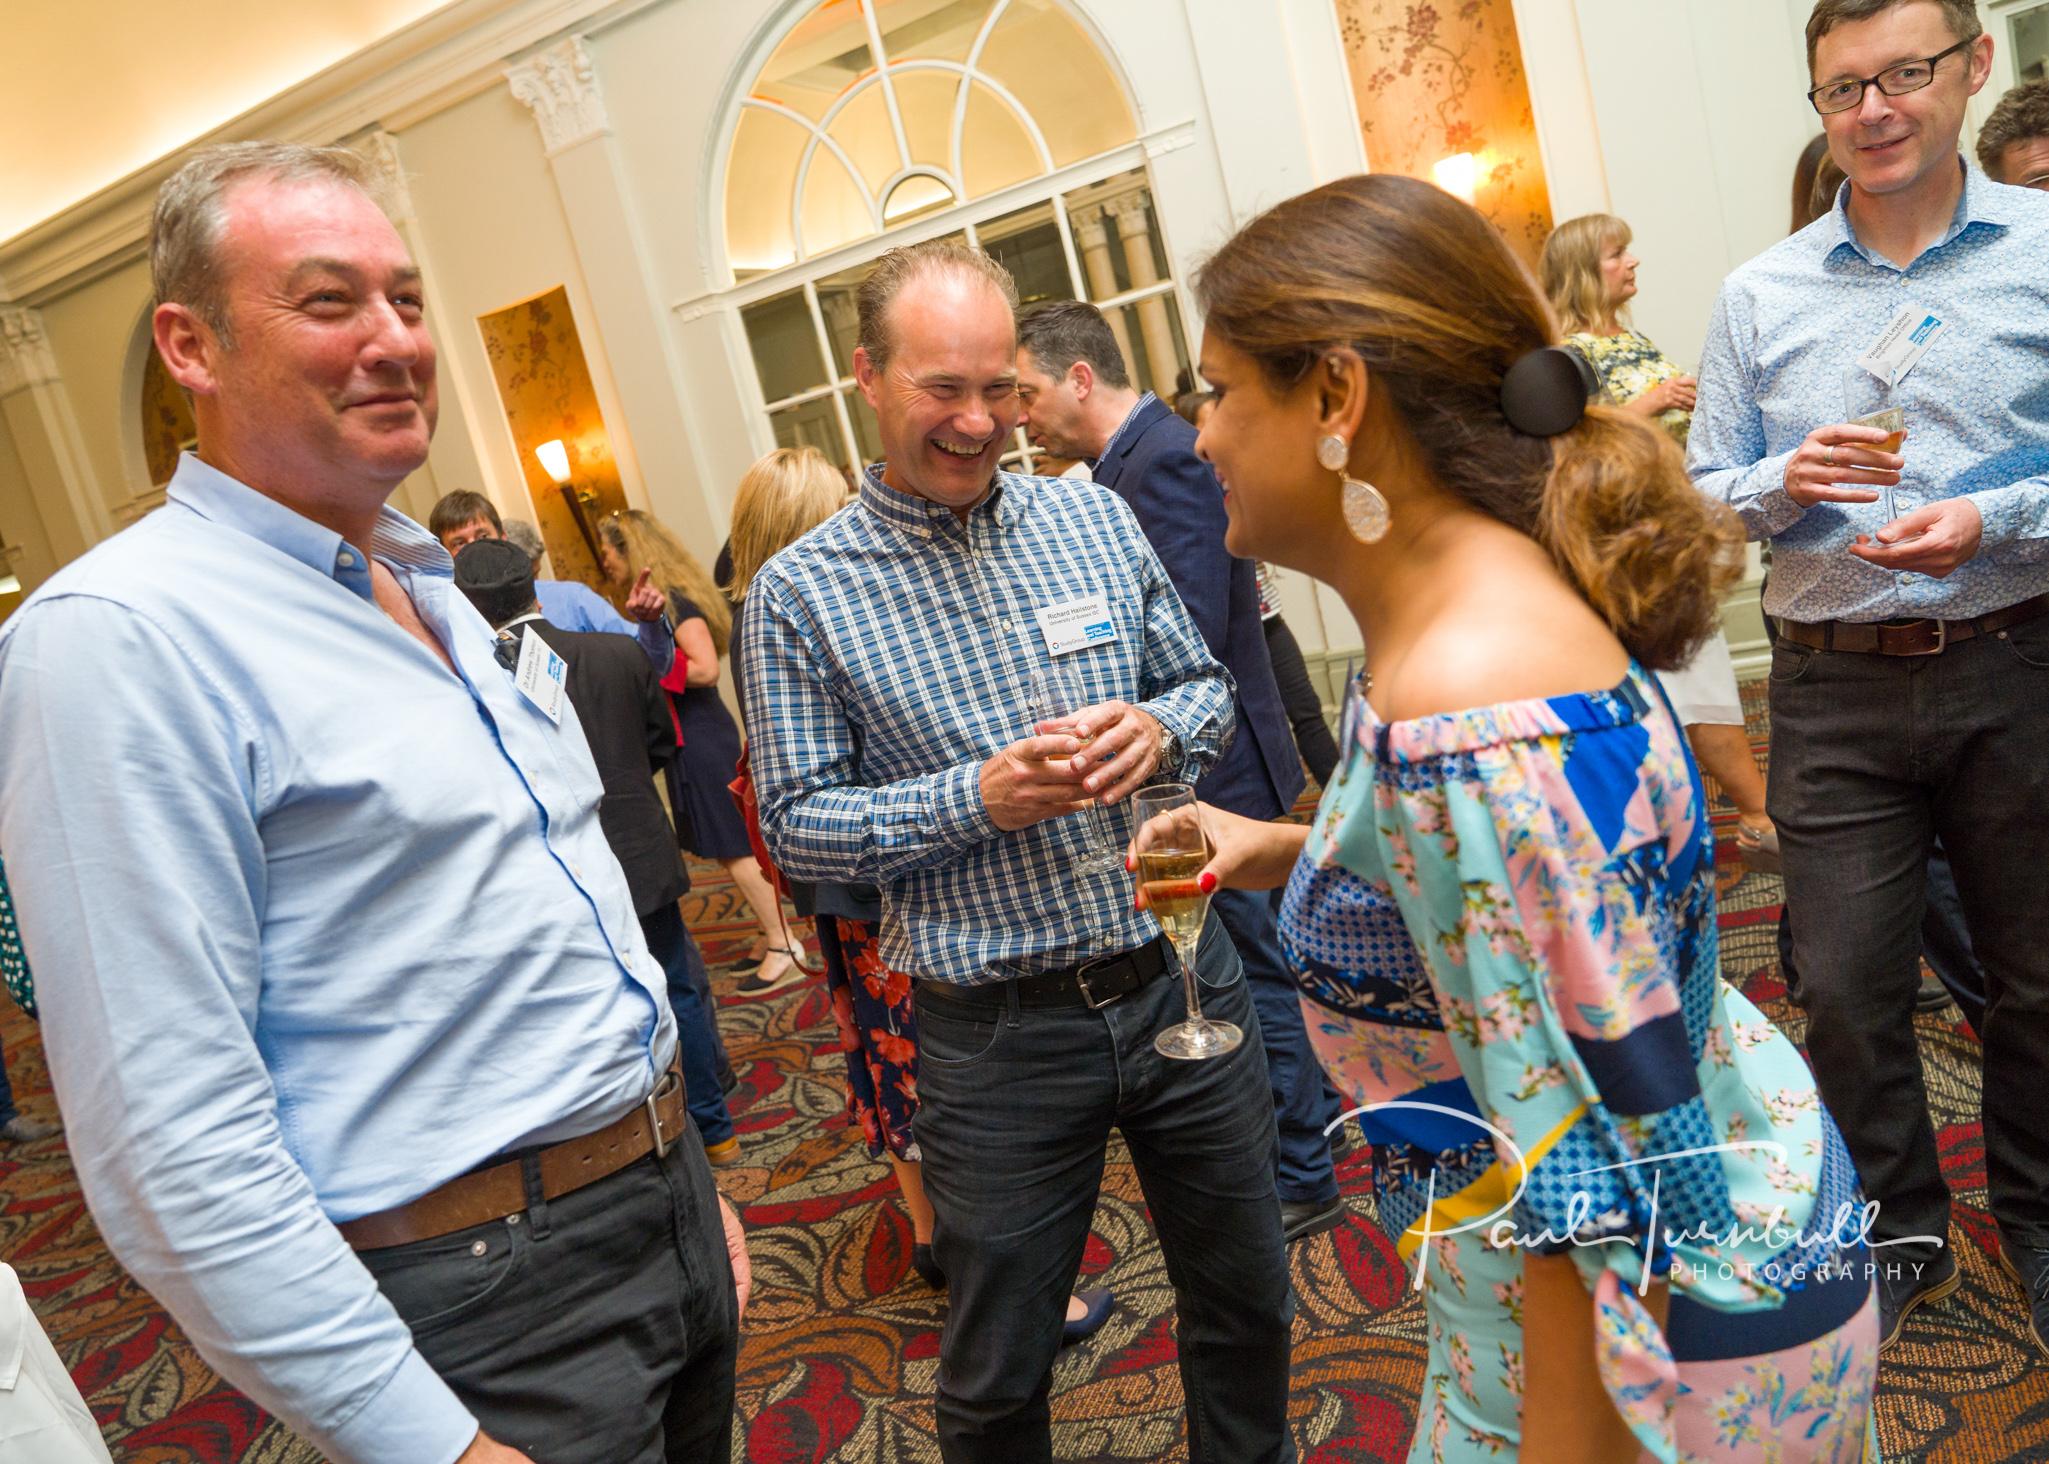 conference-event-photographer-queens-hotel-leeds-yorkshire-010.jpg